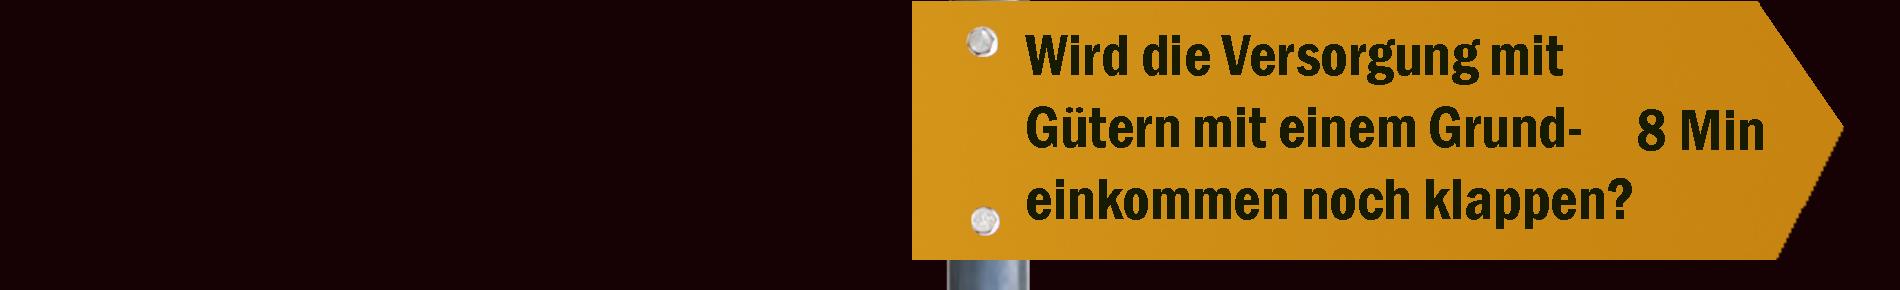 WWR_Versorgung2